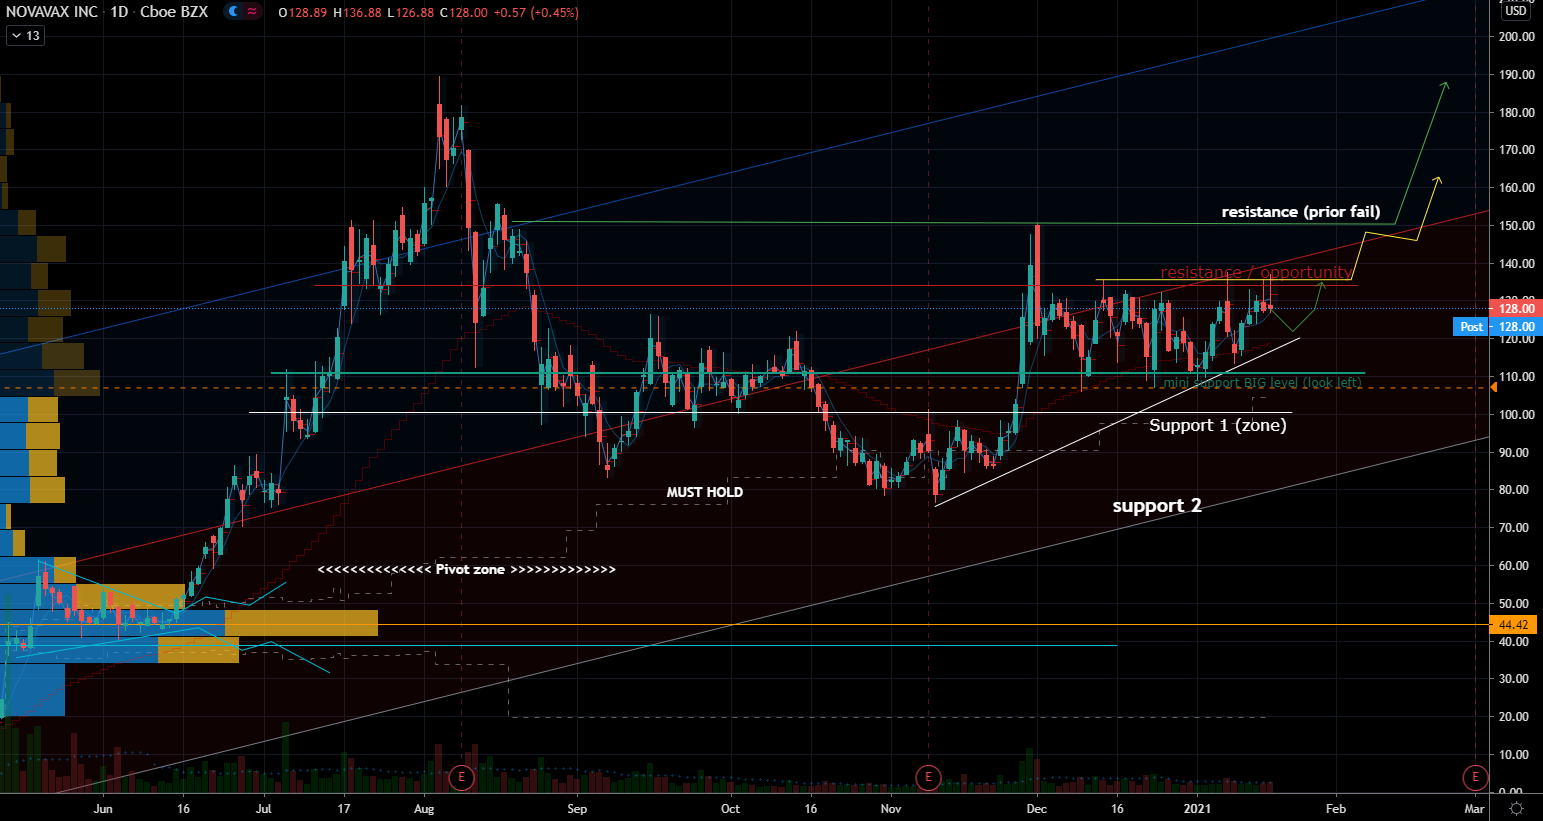 Novavax (NVAX) Stock Chart Showing Breakout Opportunity